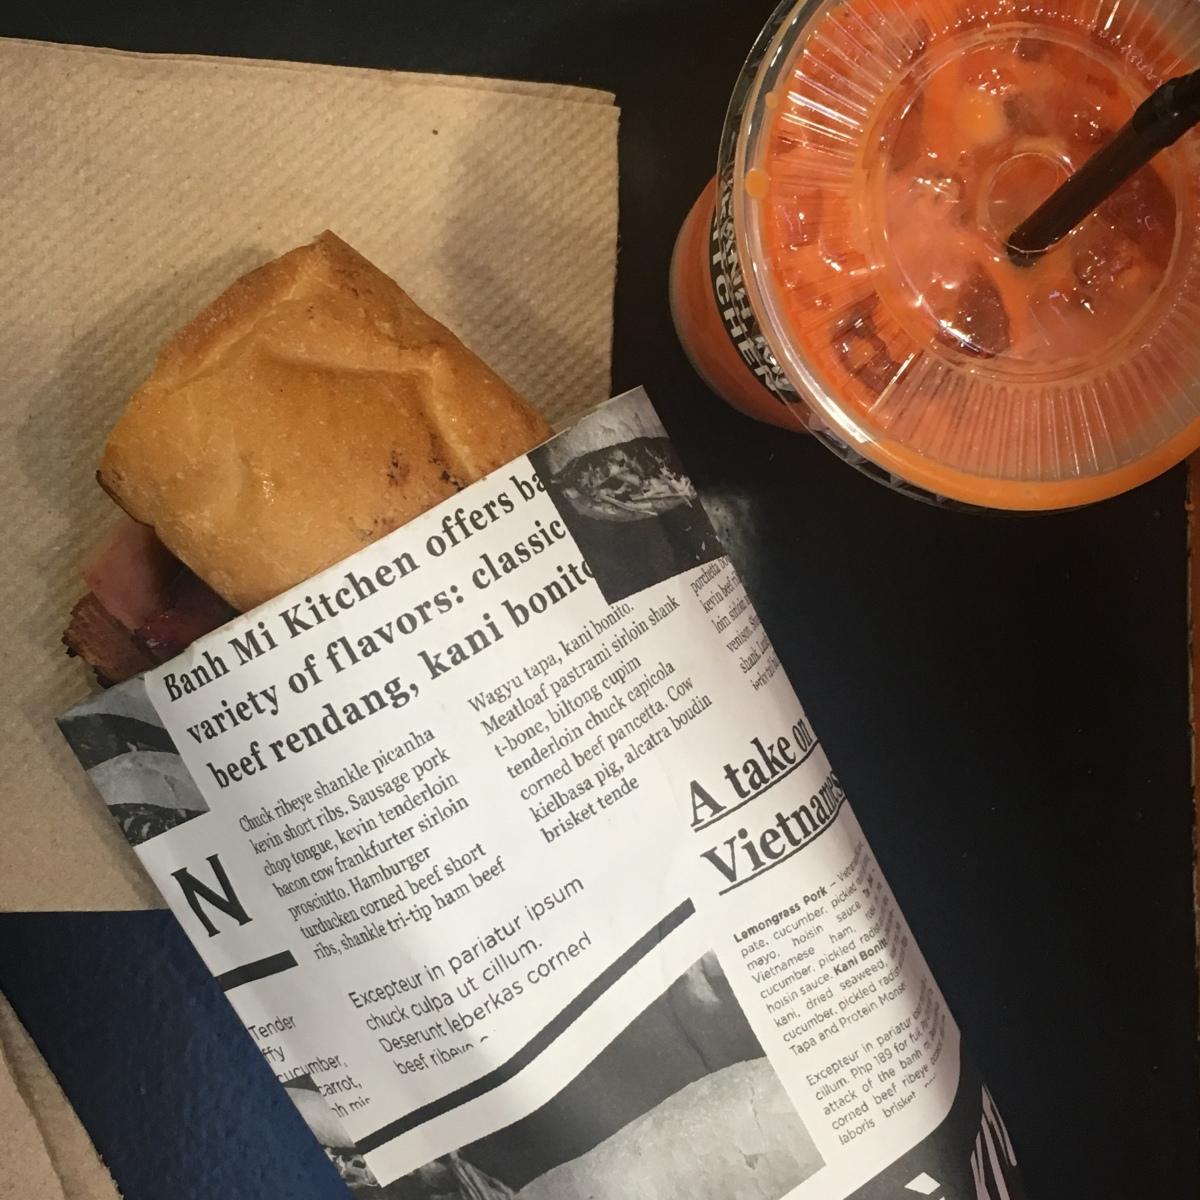 Quick Bite at Banh Mi Kitchen, TomasMorato